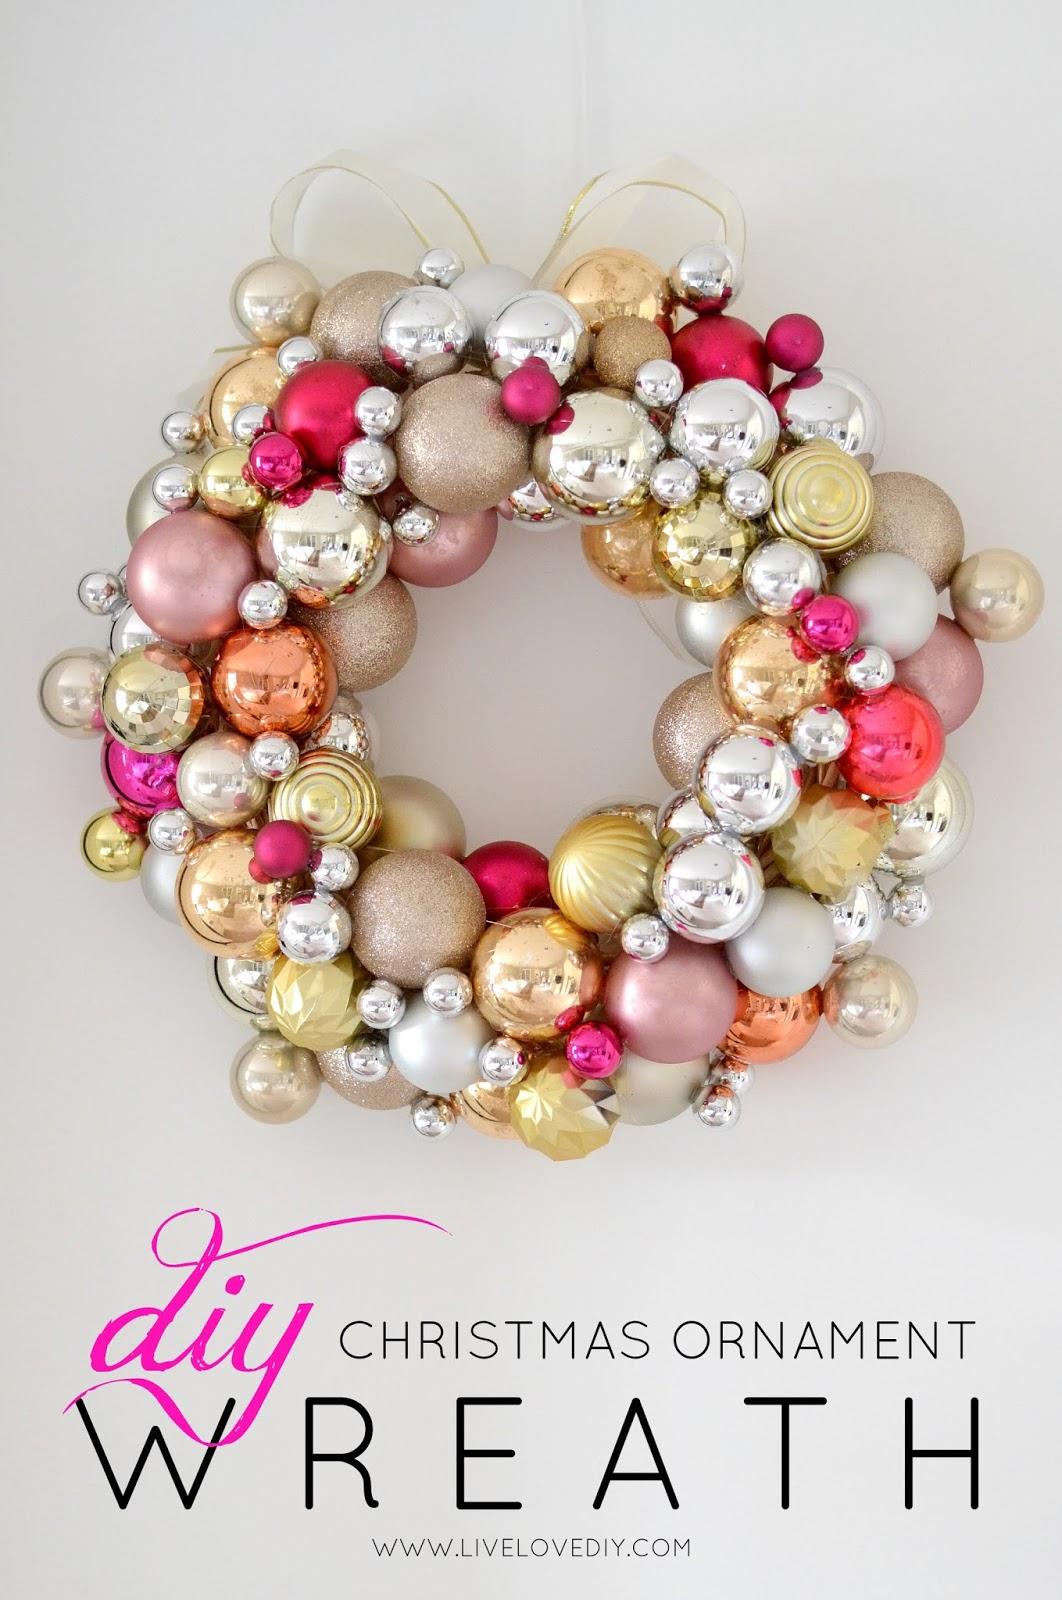 How To Make A Christmas Ornament Wreath | LiveLoveDIY ...